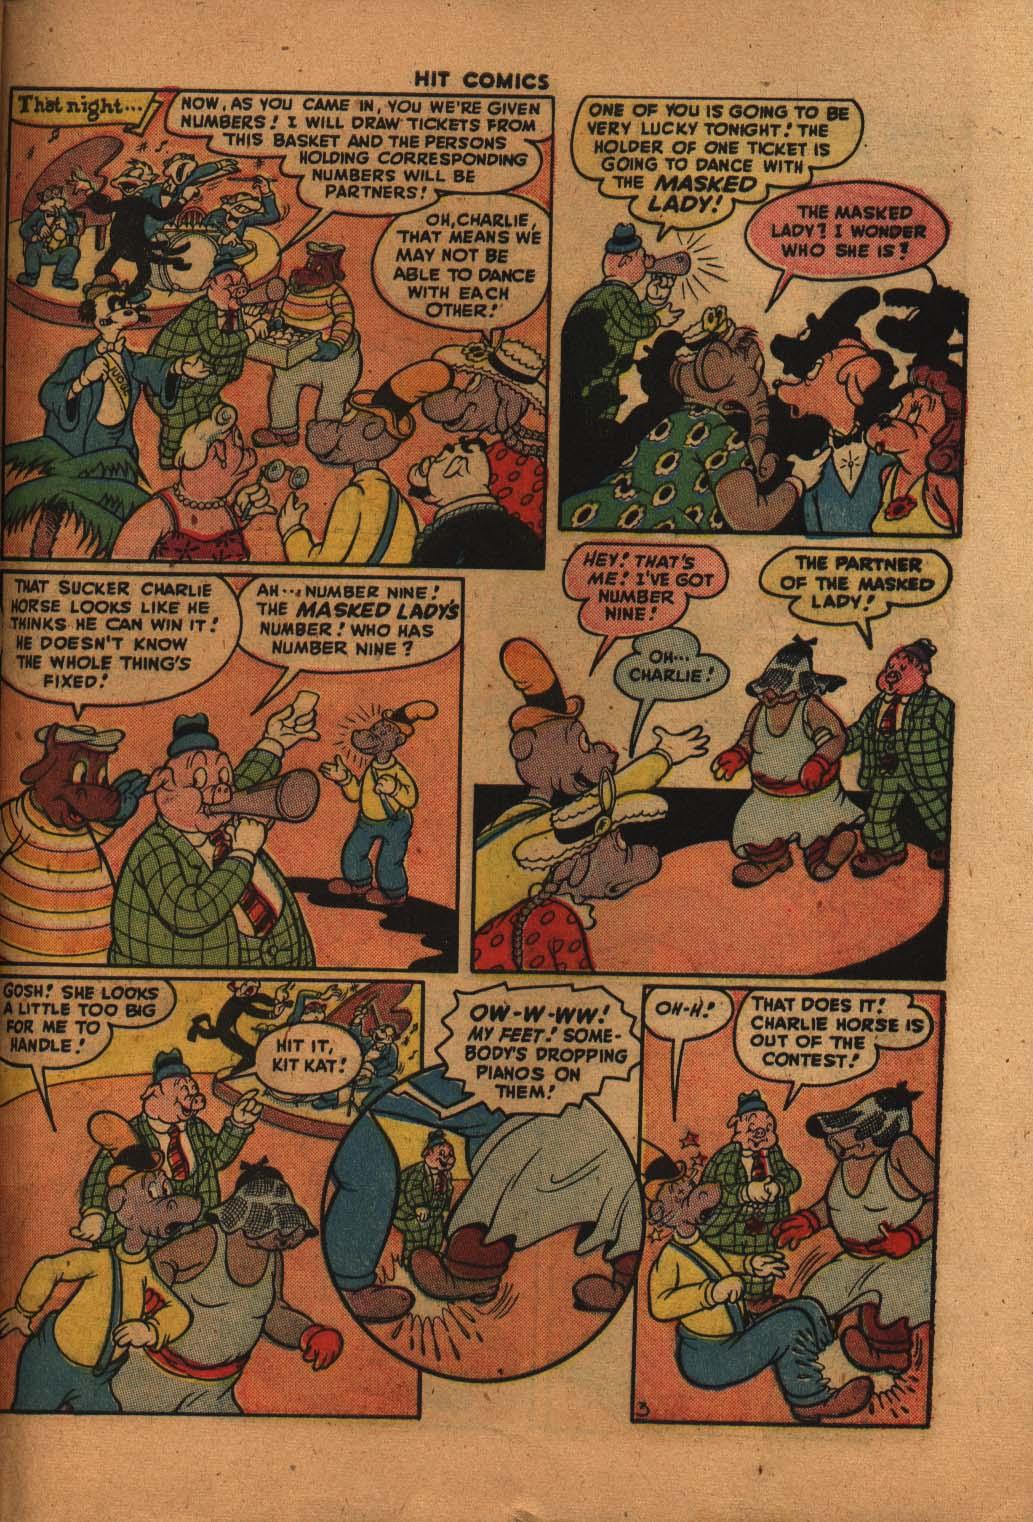 Read online Hit Comics comic -  Issue #47 - 46